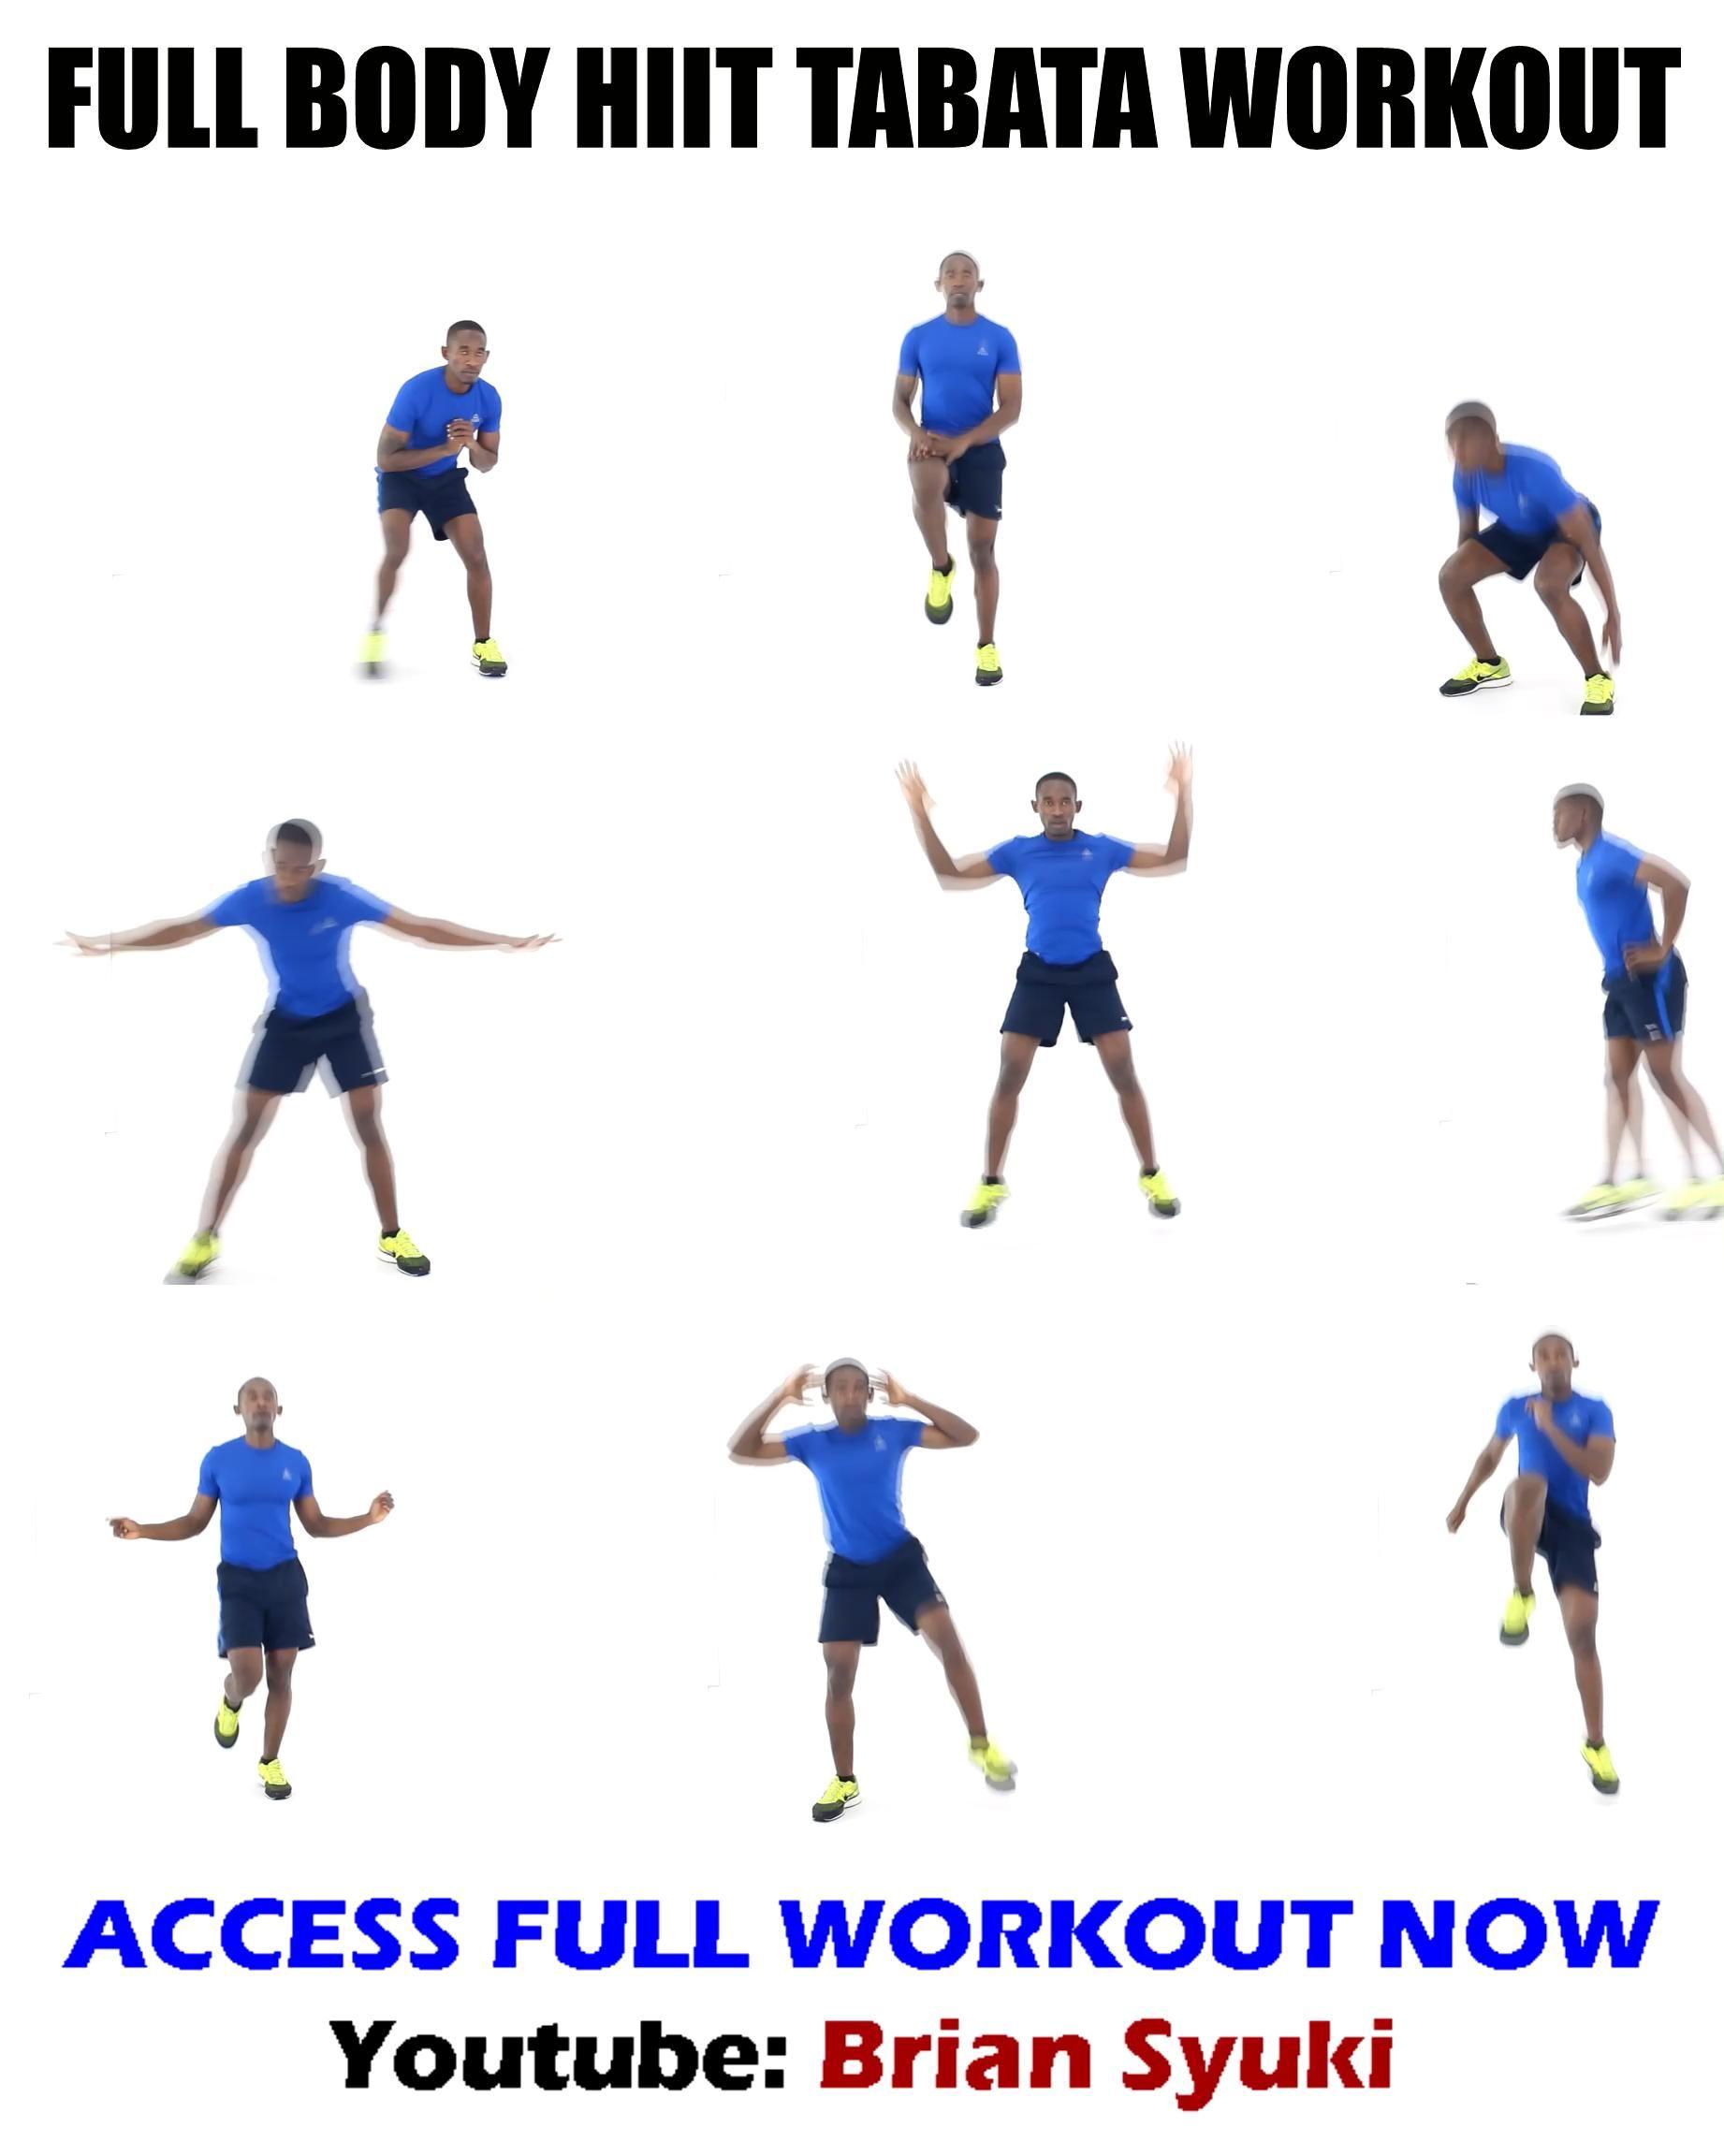 Full Body HIIT Tabata Workout